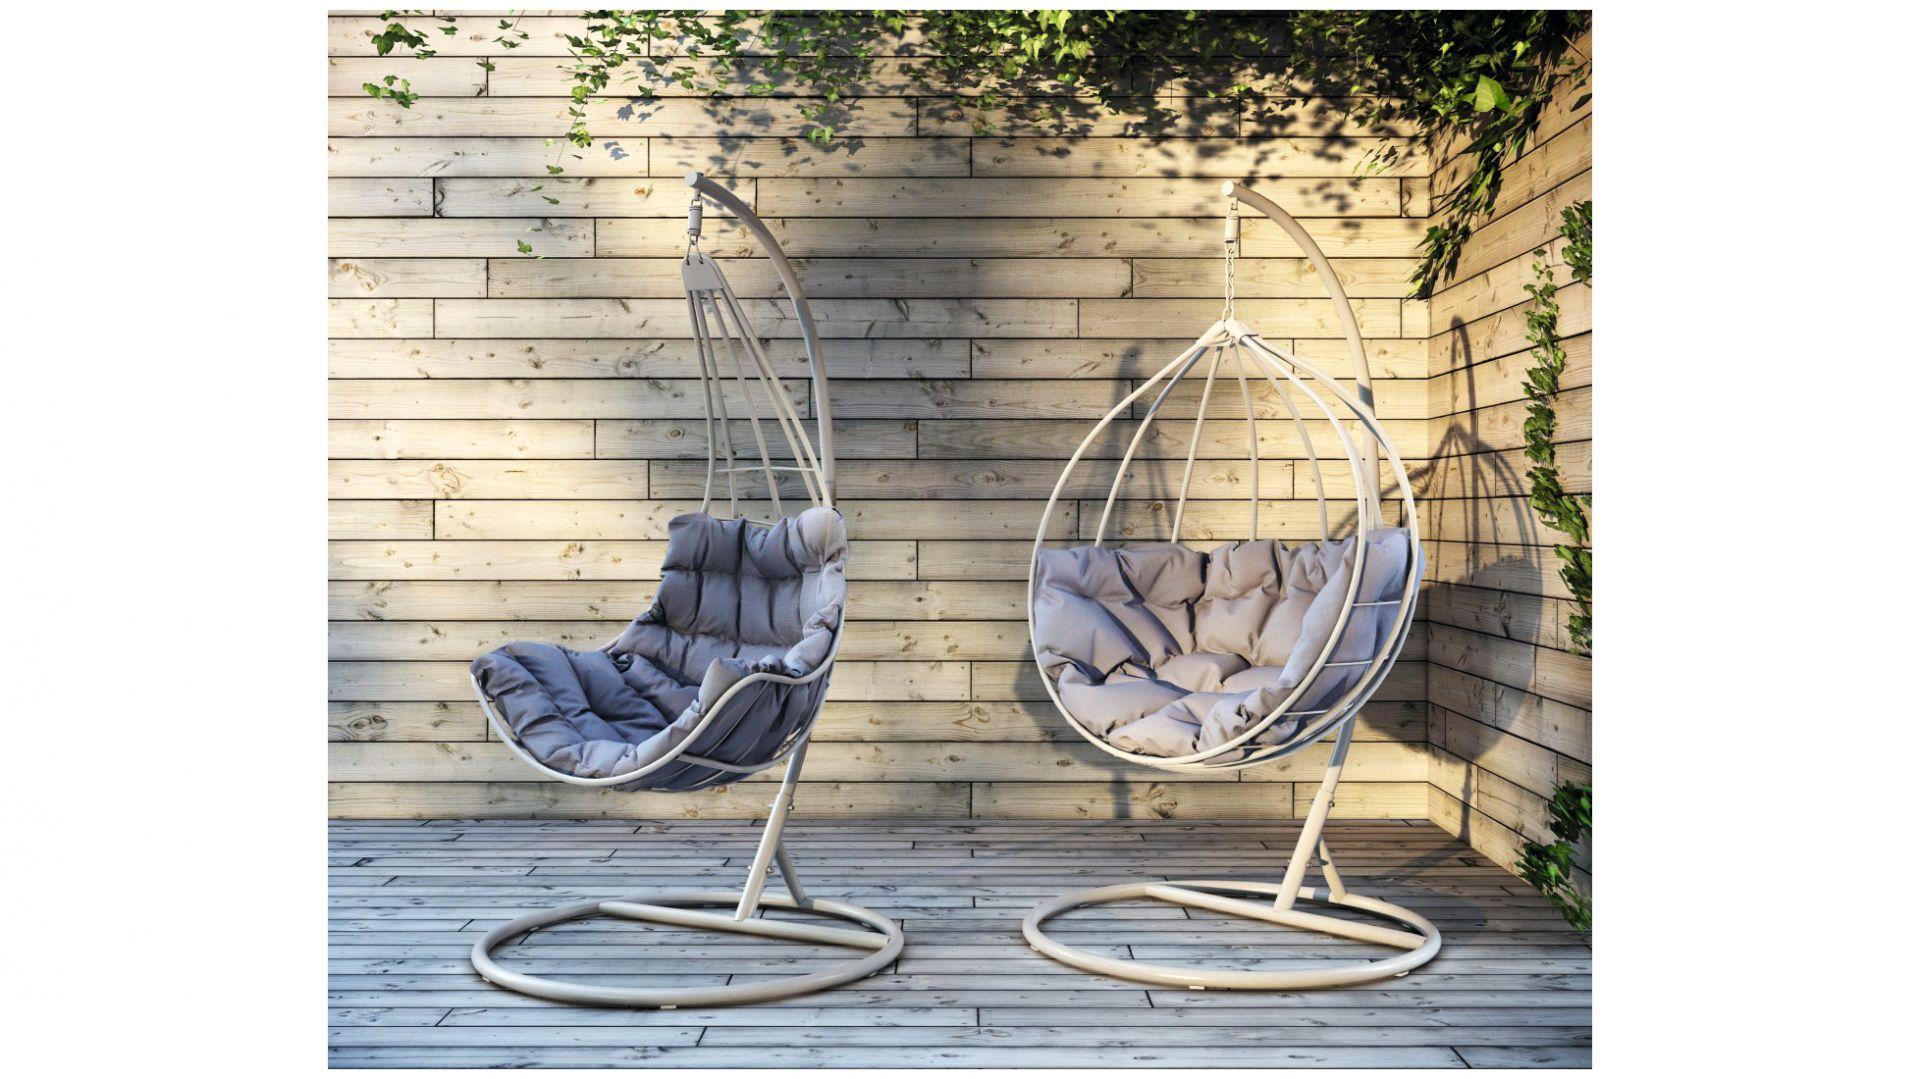 Ogrodowe hamaki, czyli fotele Roxy i Rubicon marki Miloo Home. Fot. Miloo Home